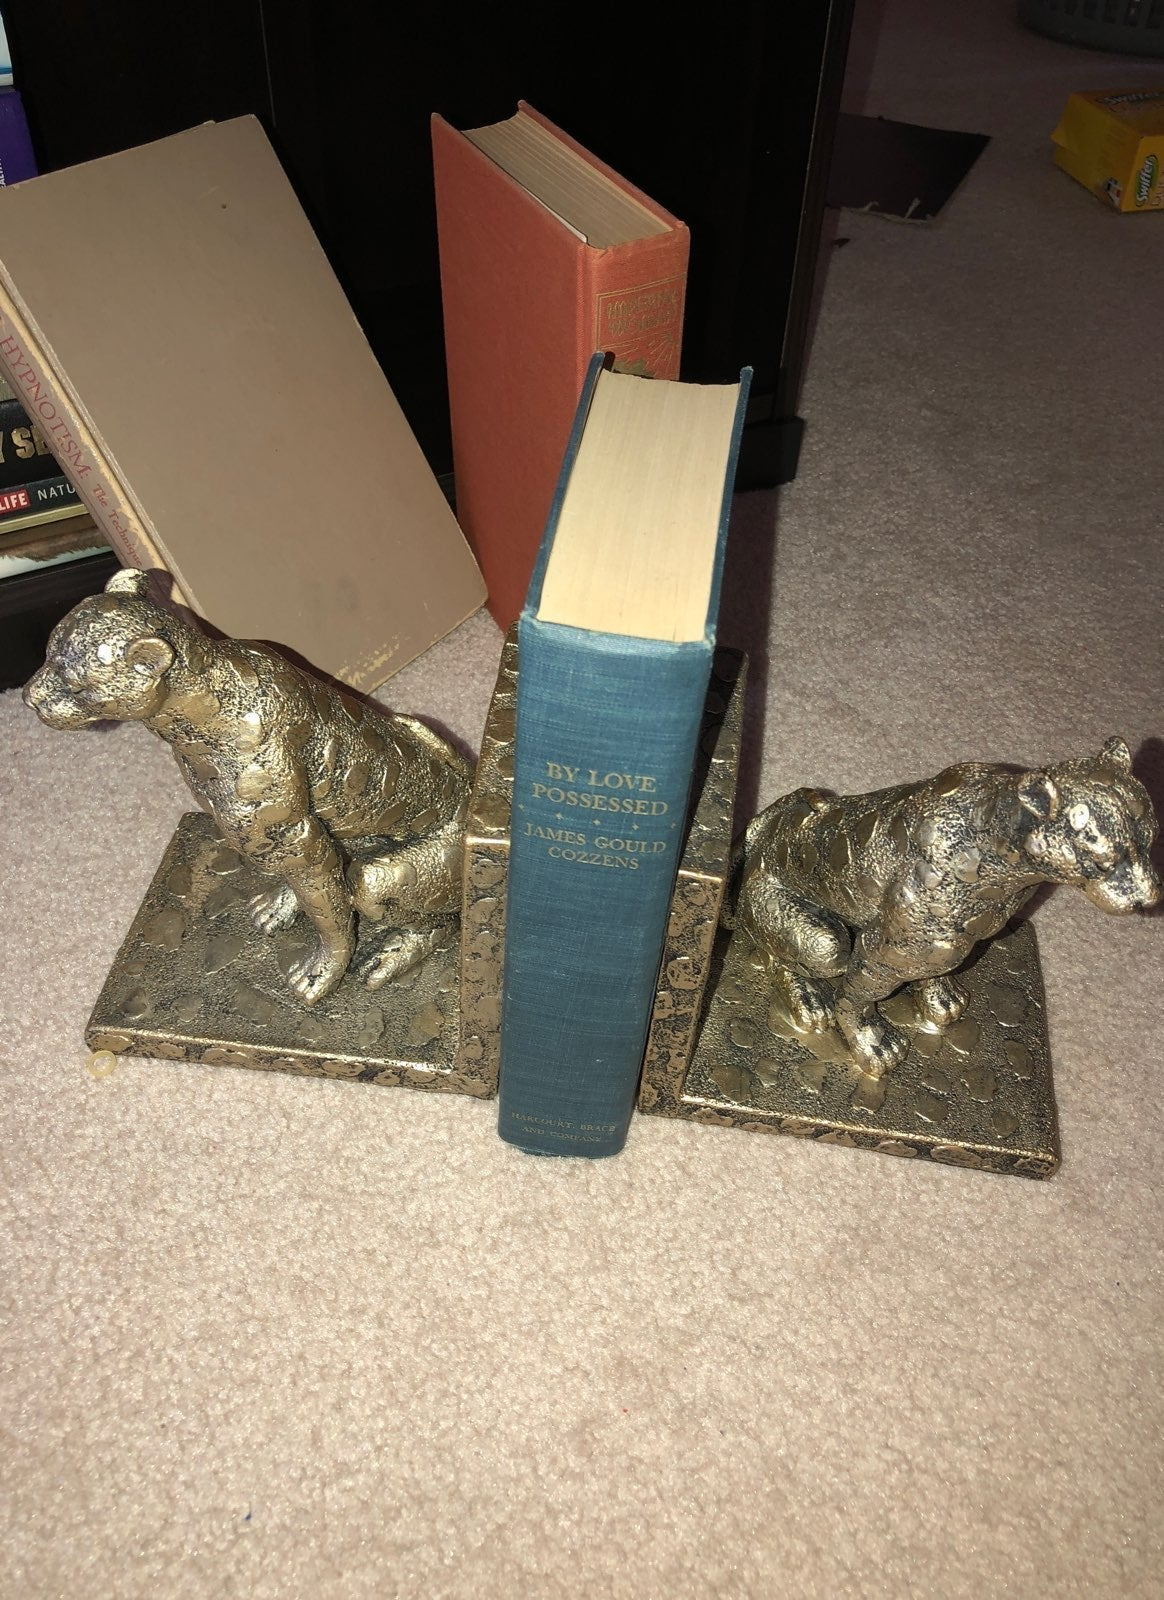 2 Gold Cheetah Book Stand Weights